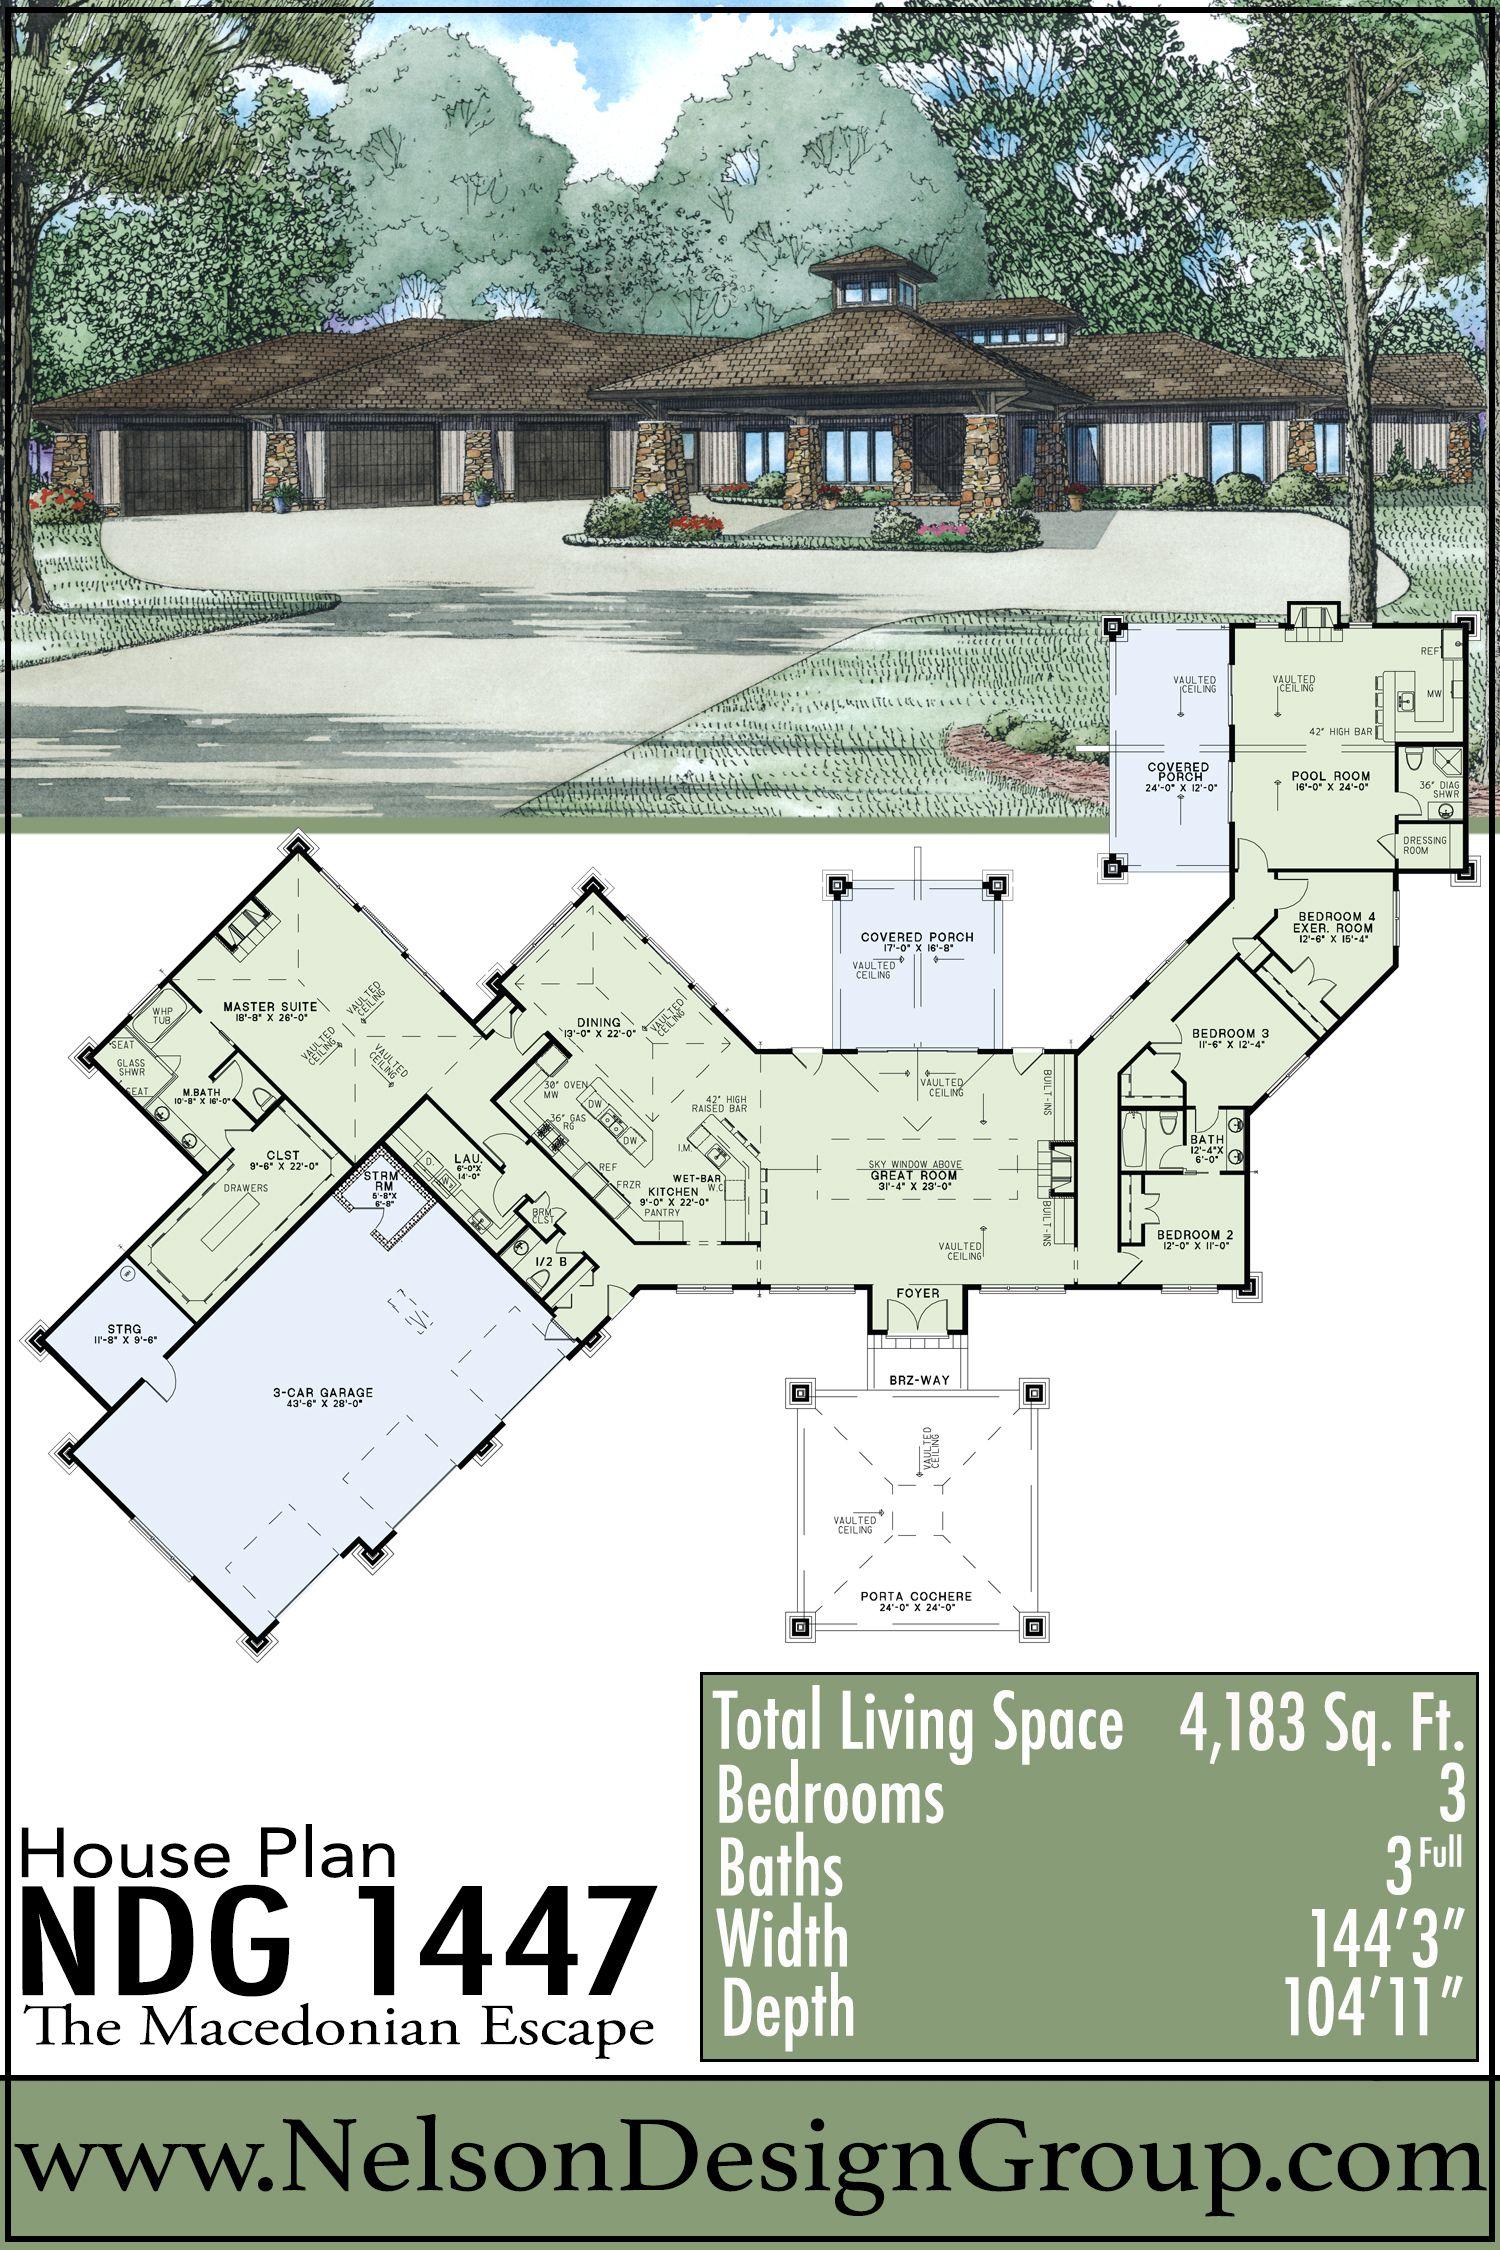 House Houses Home Homes Houseplans Houseplan Homeplans Homeplan Dreamhome Nextho House Plans Mediterranean House Plan Modern Contemporary House Plans